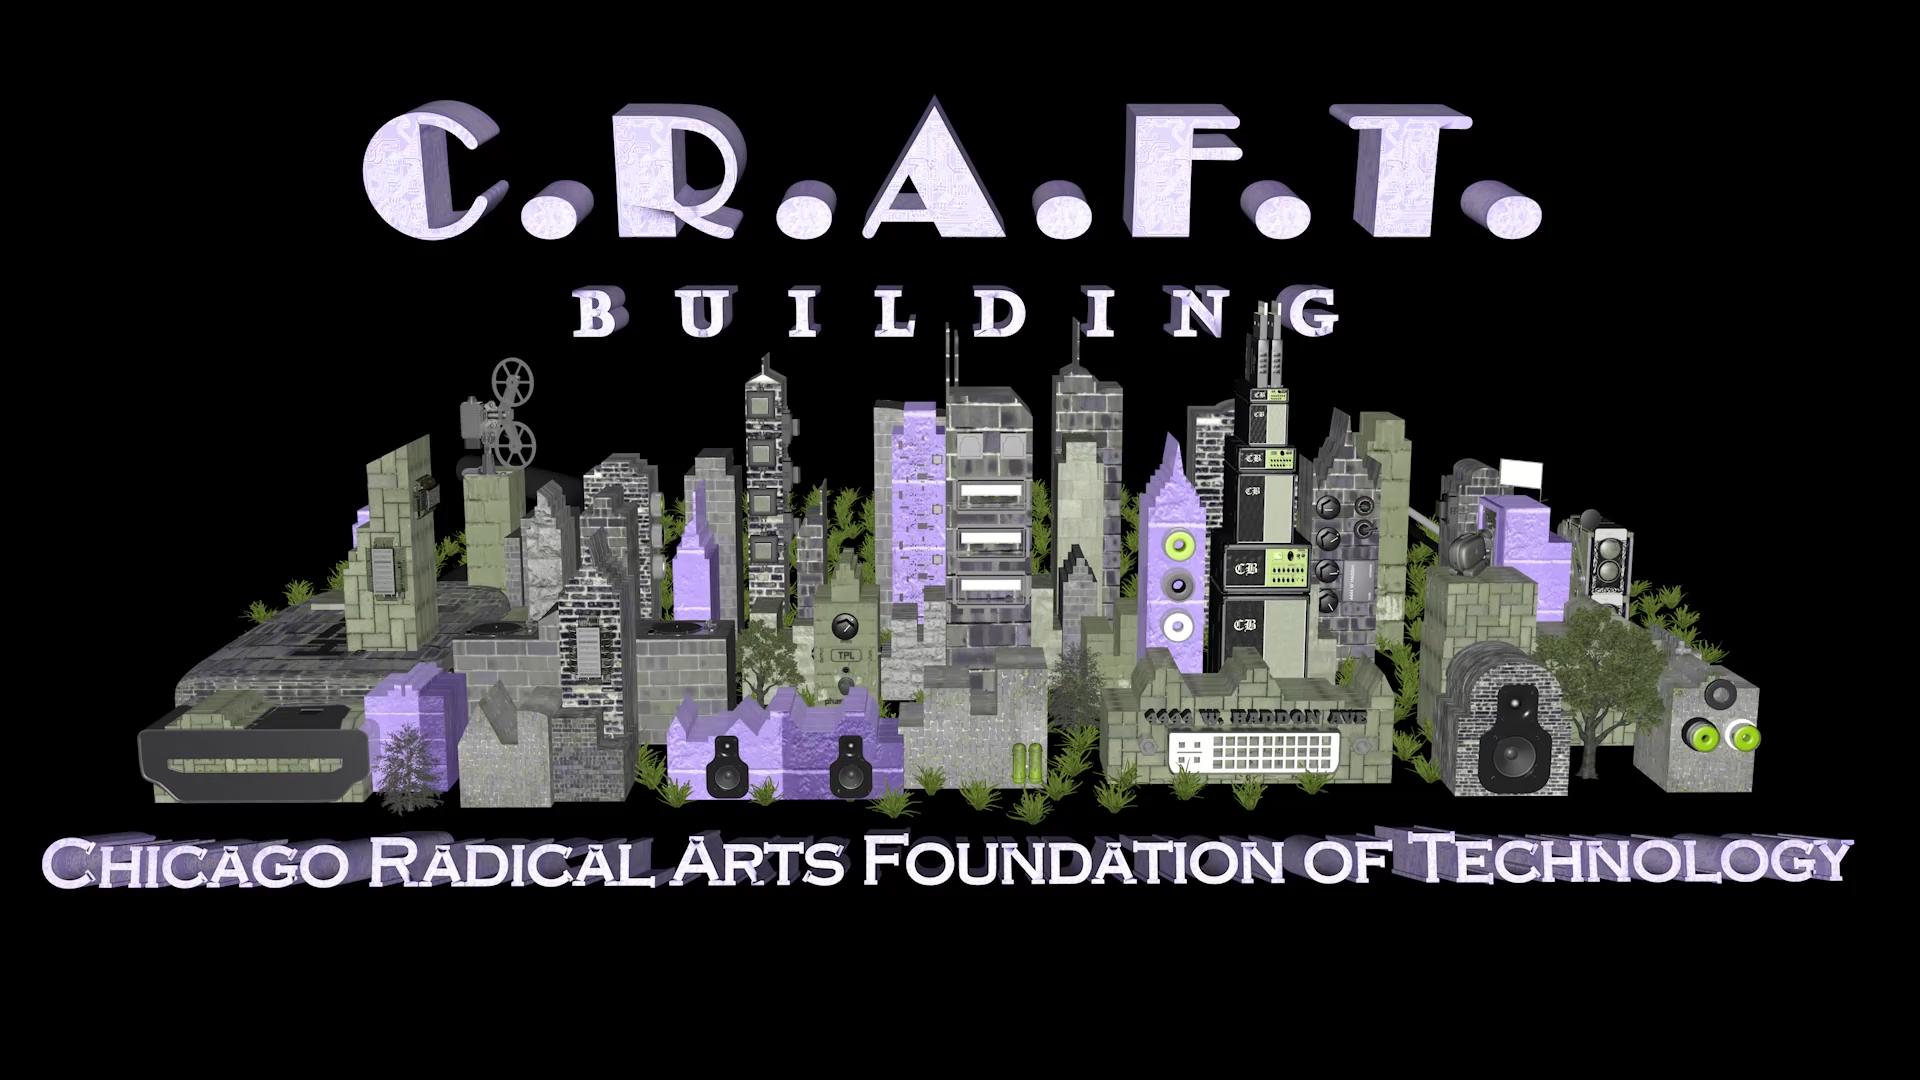 Beginning screenshot of the CRAFT animation.